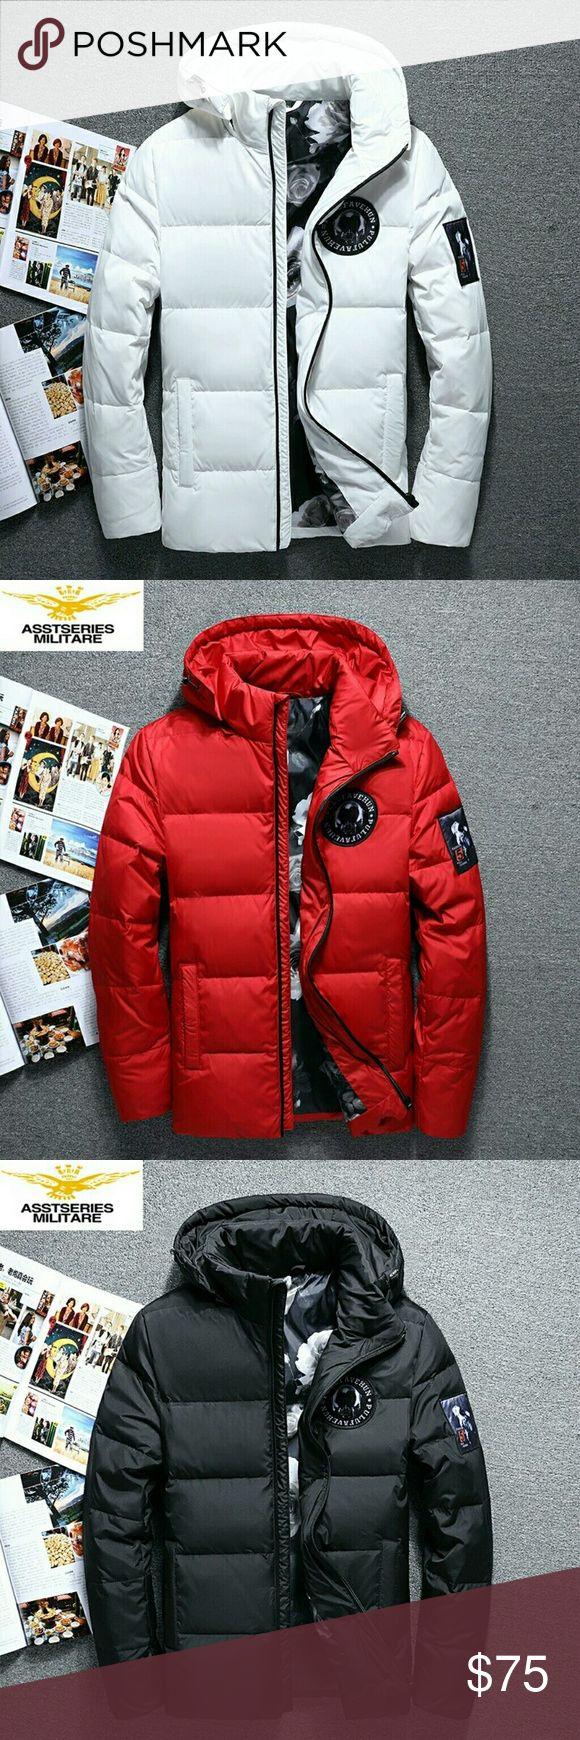 2017 New Winter Coat for Men M/ 165-170cm Suitable for body weight (50kg-60kg) L/ 170-173cm Suitable body weight (56kg-70kg) XL/ 174-175cm Suitable for weight (70kg 80kg) XL/ 176-180cm Suitable for weight (75kg 85kg)  3XL/ 176-180cm Suitable for weight (bok- 95kg) Jackets & Coats Raincoats